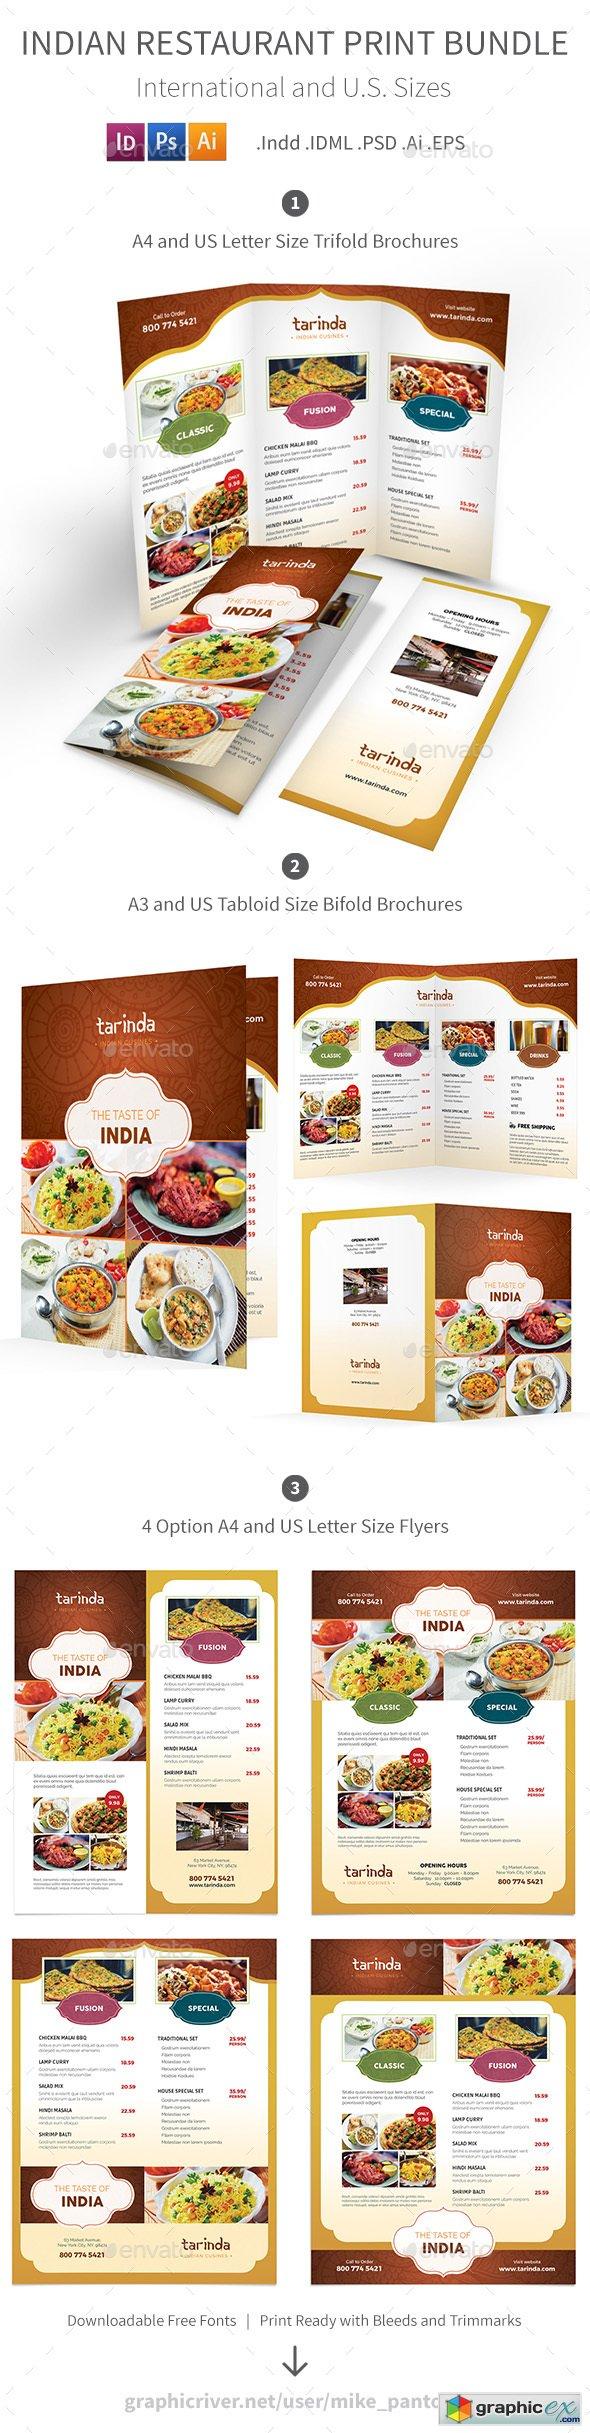 Free downloadable restaurant menu templates